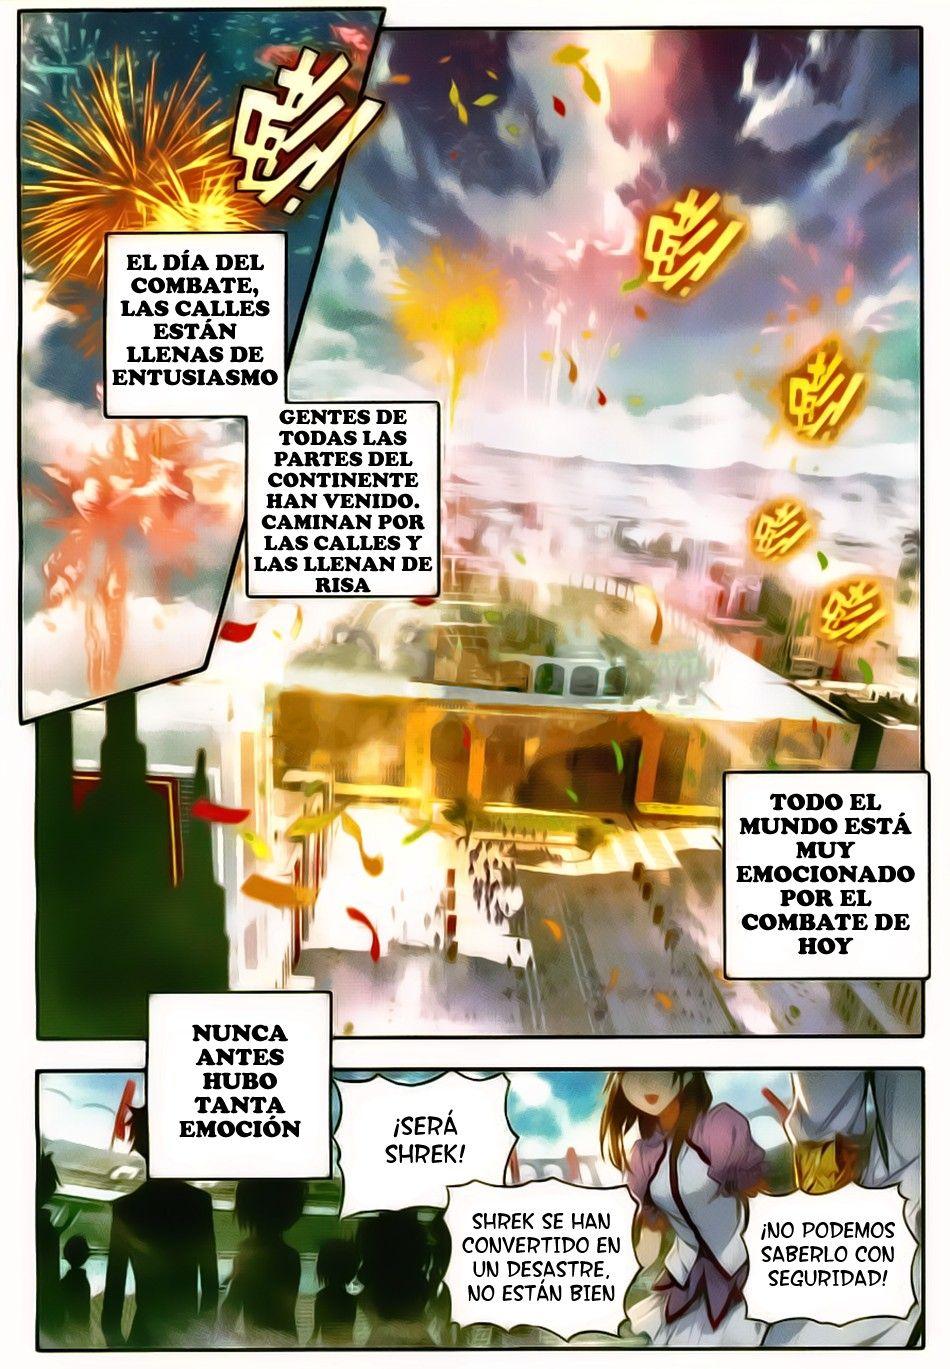 http://c5.ninemanga.com/es_manga/pic2/33/16417/514027/c05ba499b1778466cb7042b6b70676ce.jpg Page 2